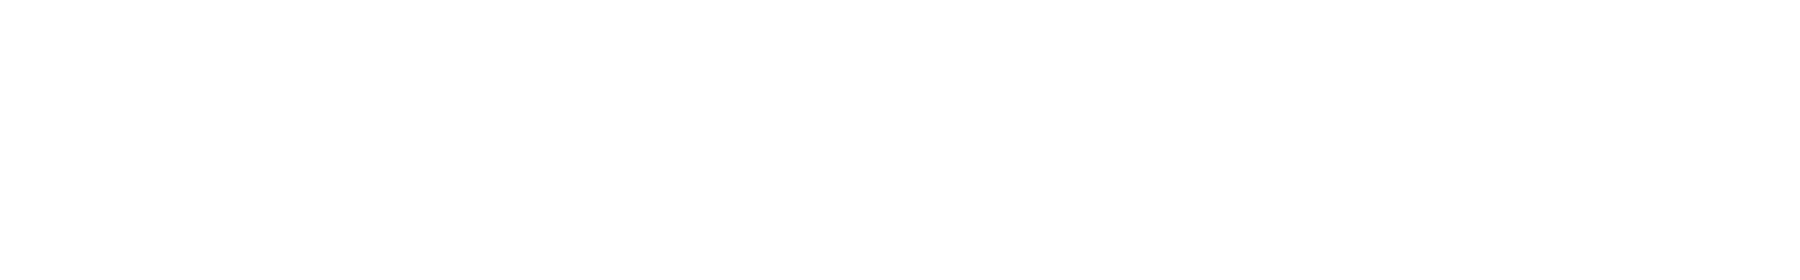 melody 22bpm90keyf